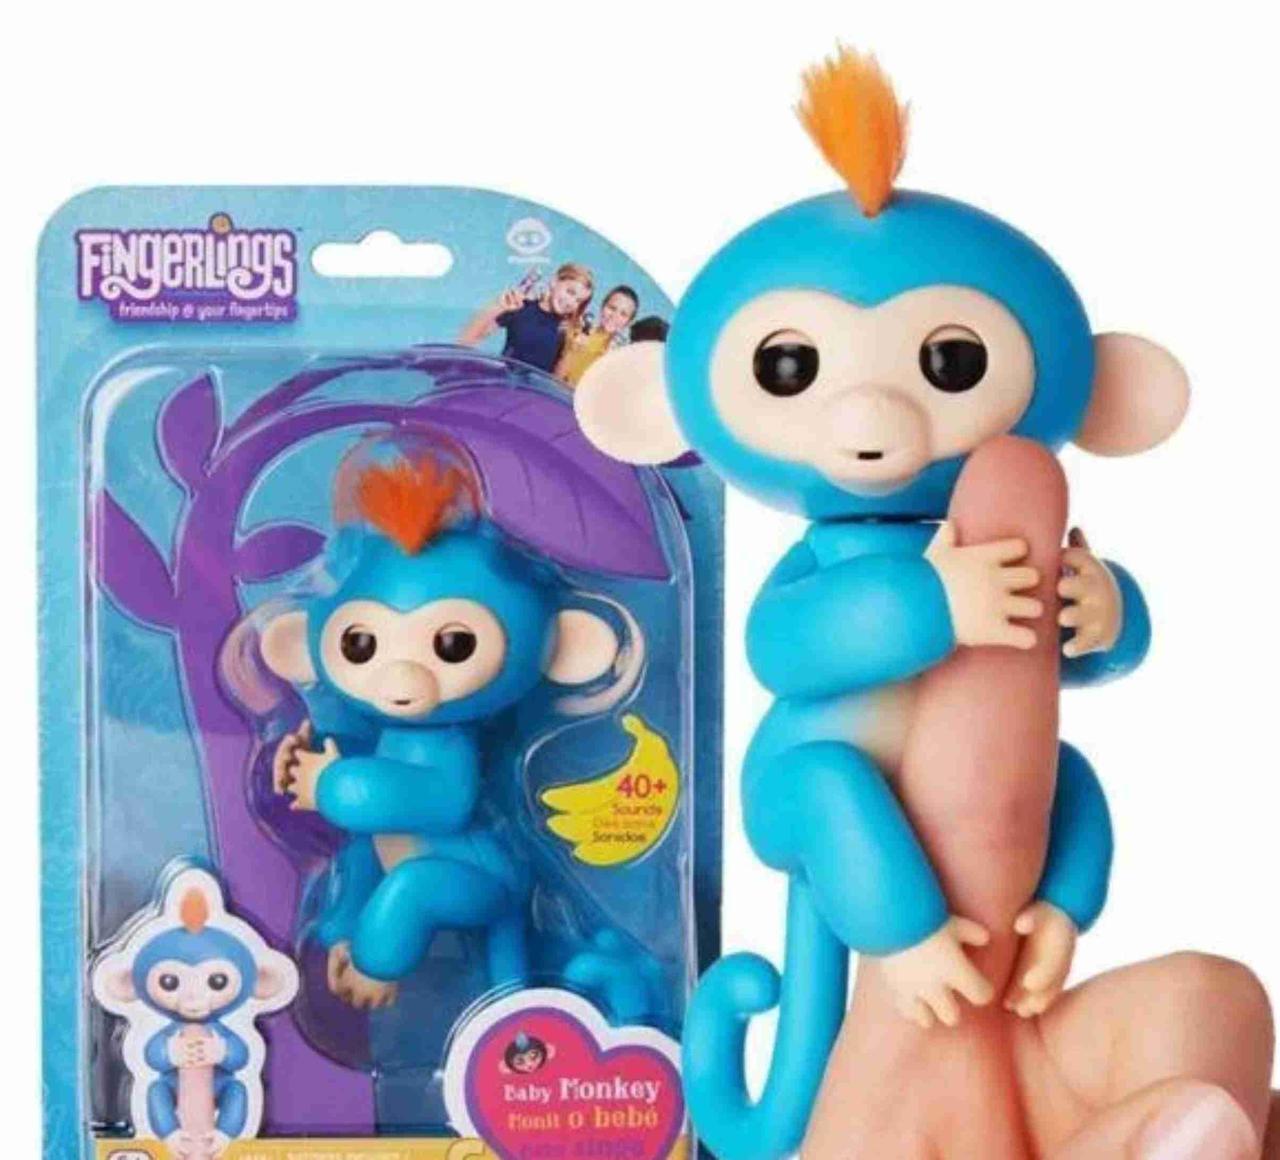 Fingerling Finger Monkey Интерактивная игрушка ручная обезьянка. Игрушка FingerMonkey